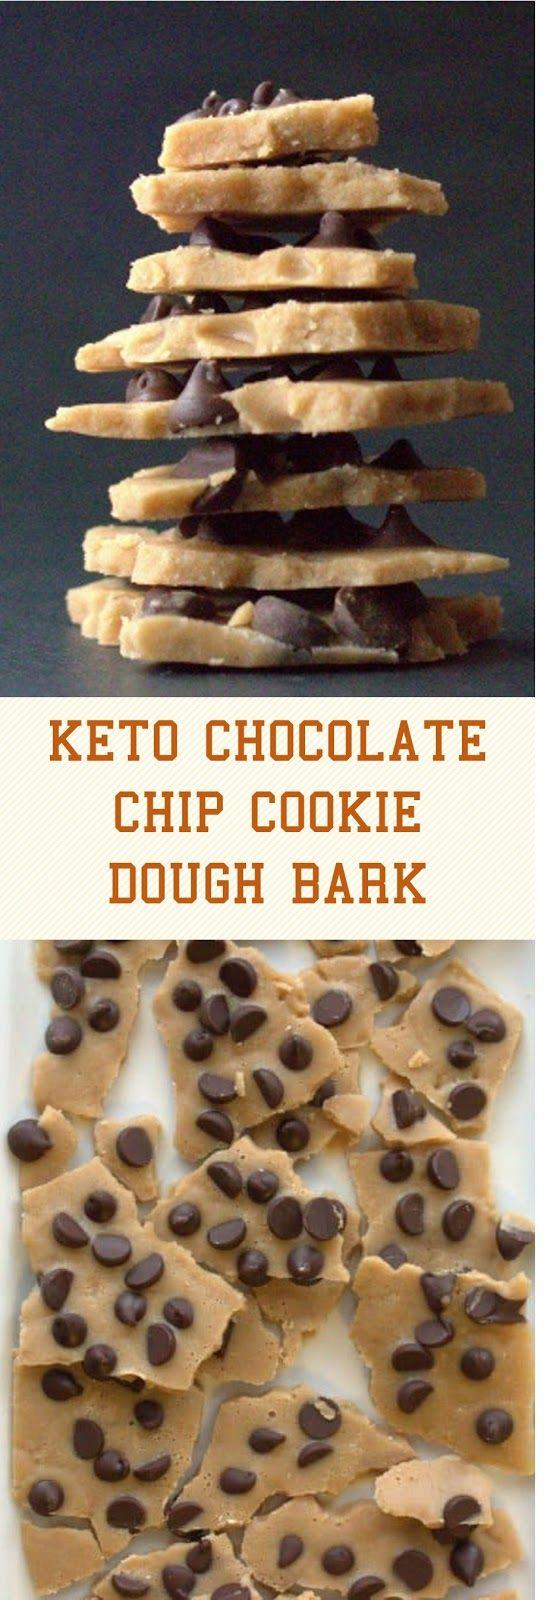 KETO CHOCOLATE CHIP COOKIE DOUGH BARK #ketochocolate #chocolatechipcookiedough